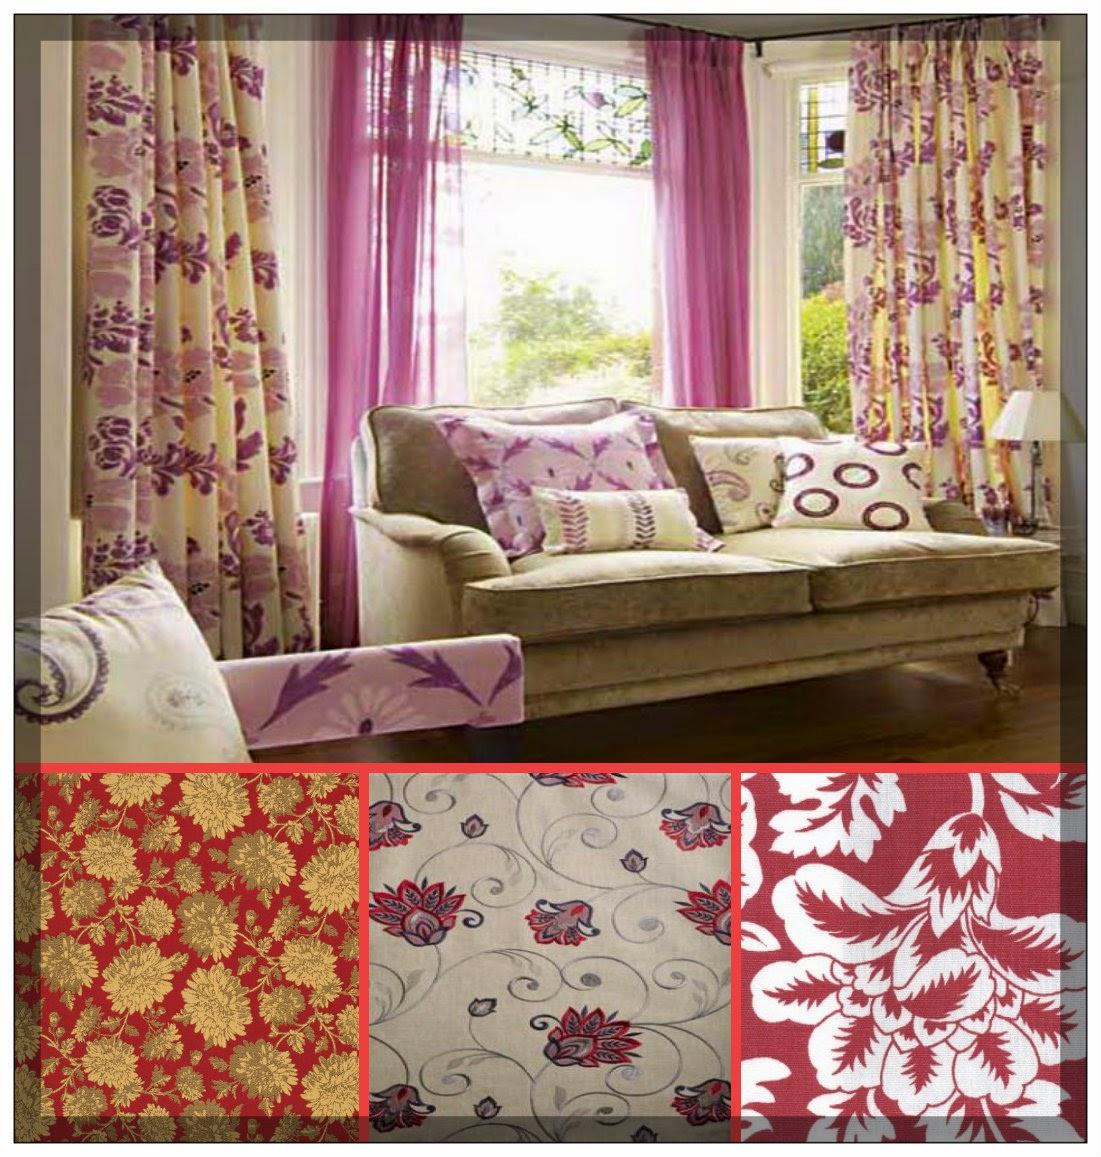 Interior Decor Home Decoration Ideas With Home Fabrics And Rugs Home Decor Fabrics Online